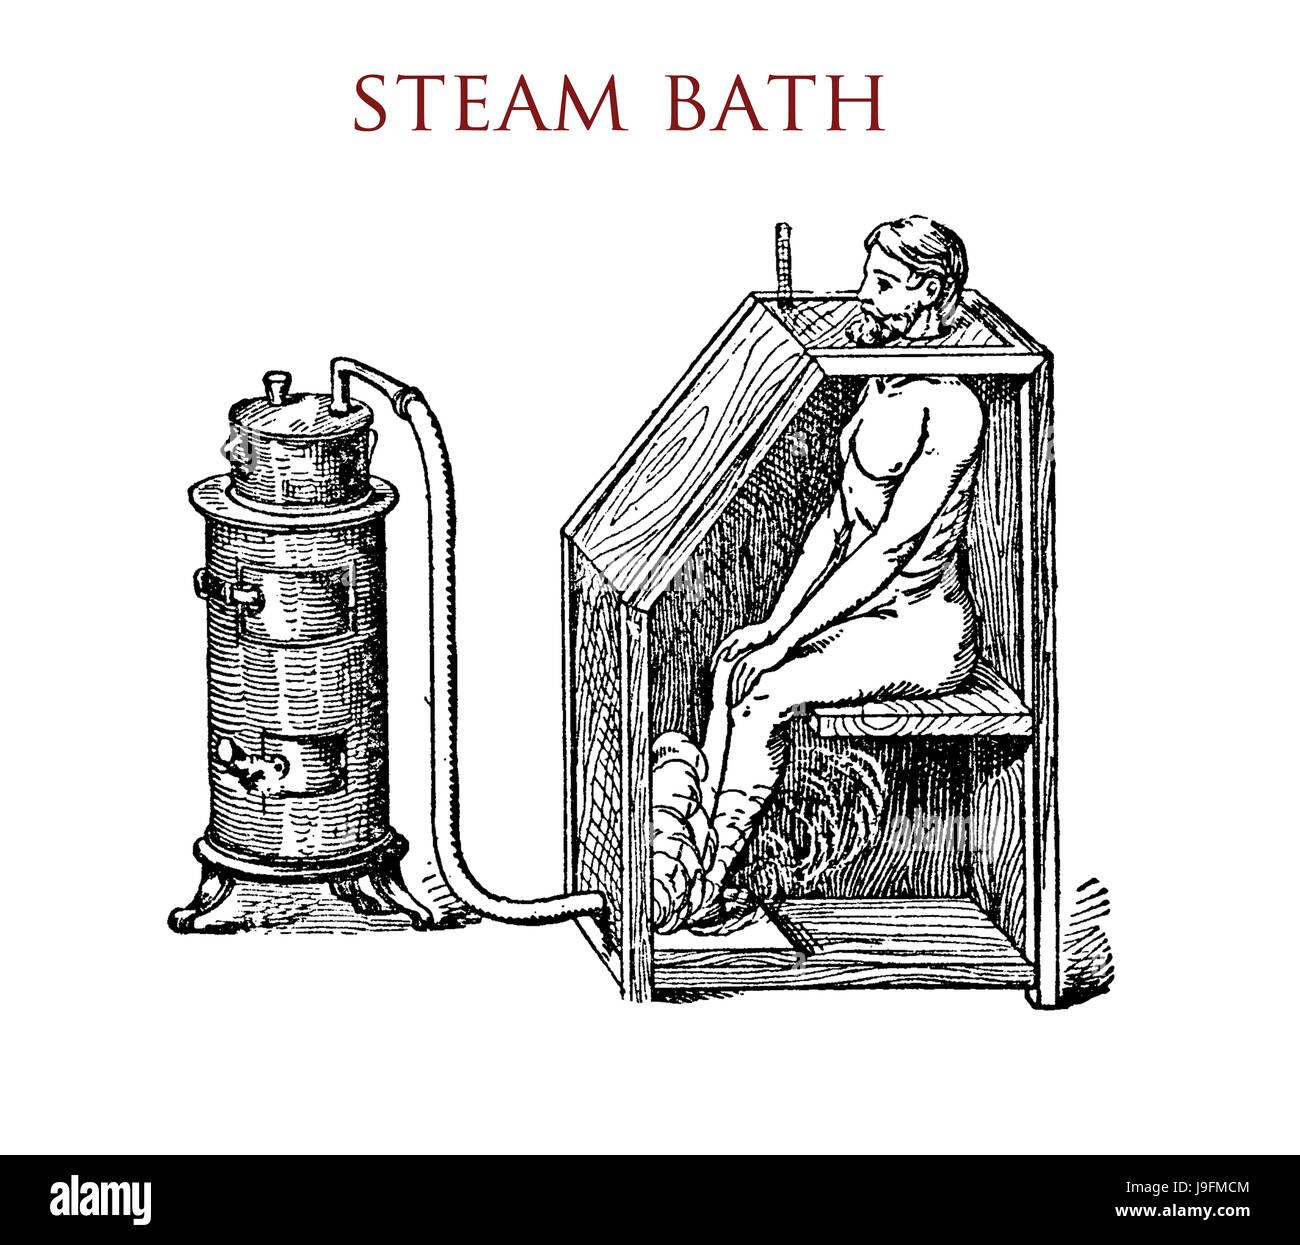 Full-body steam bath device, vintage illustration - Stock Image